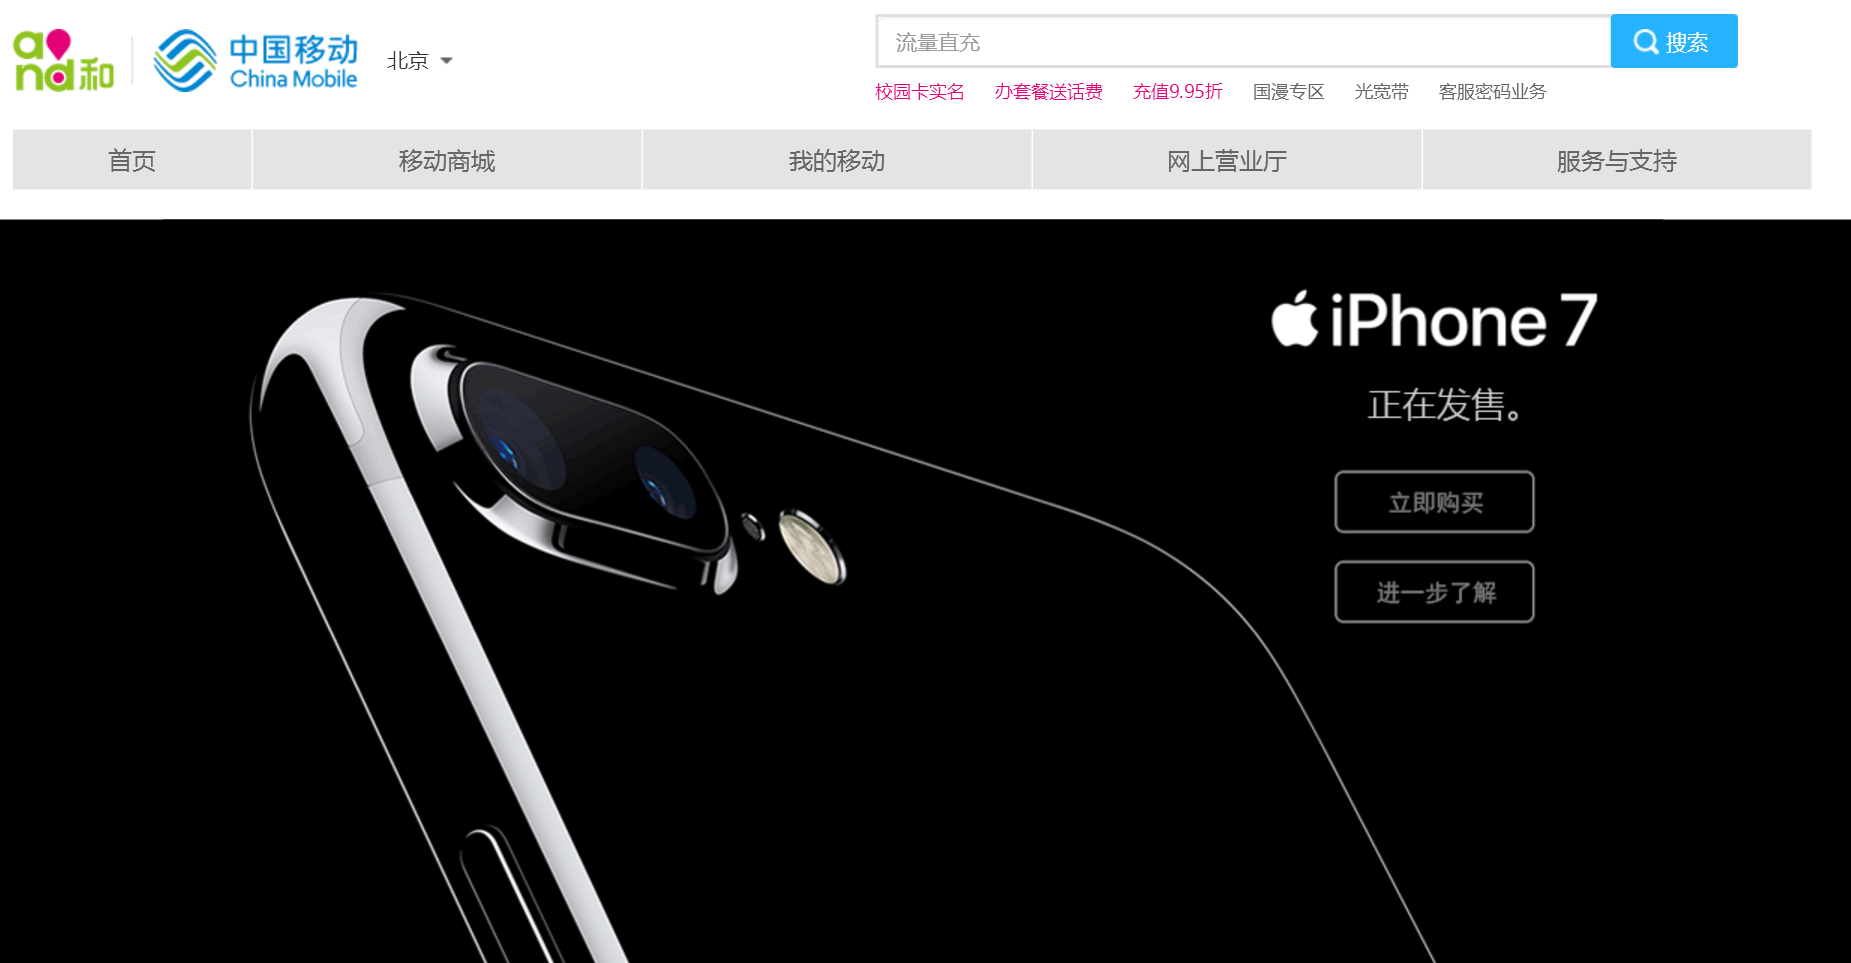 iPhone 7今日开售:7Plus更受宠,亮黑色一机难求的照片 - 1